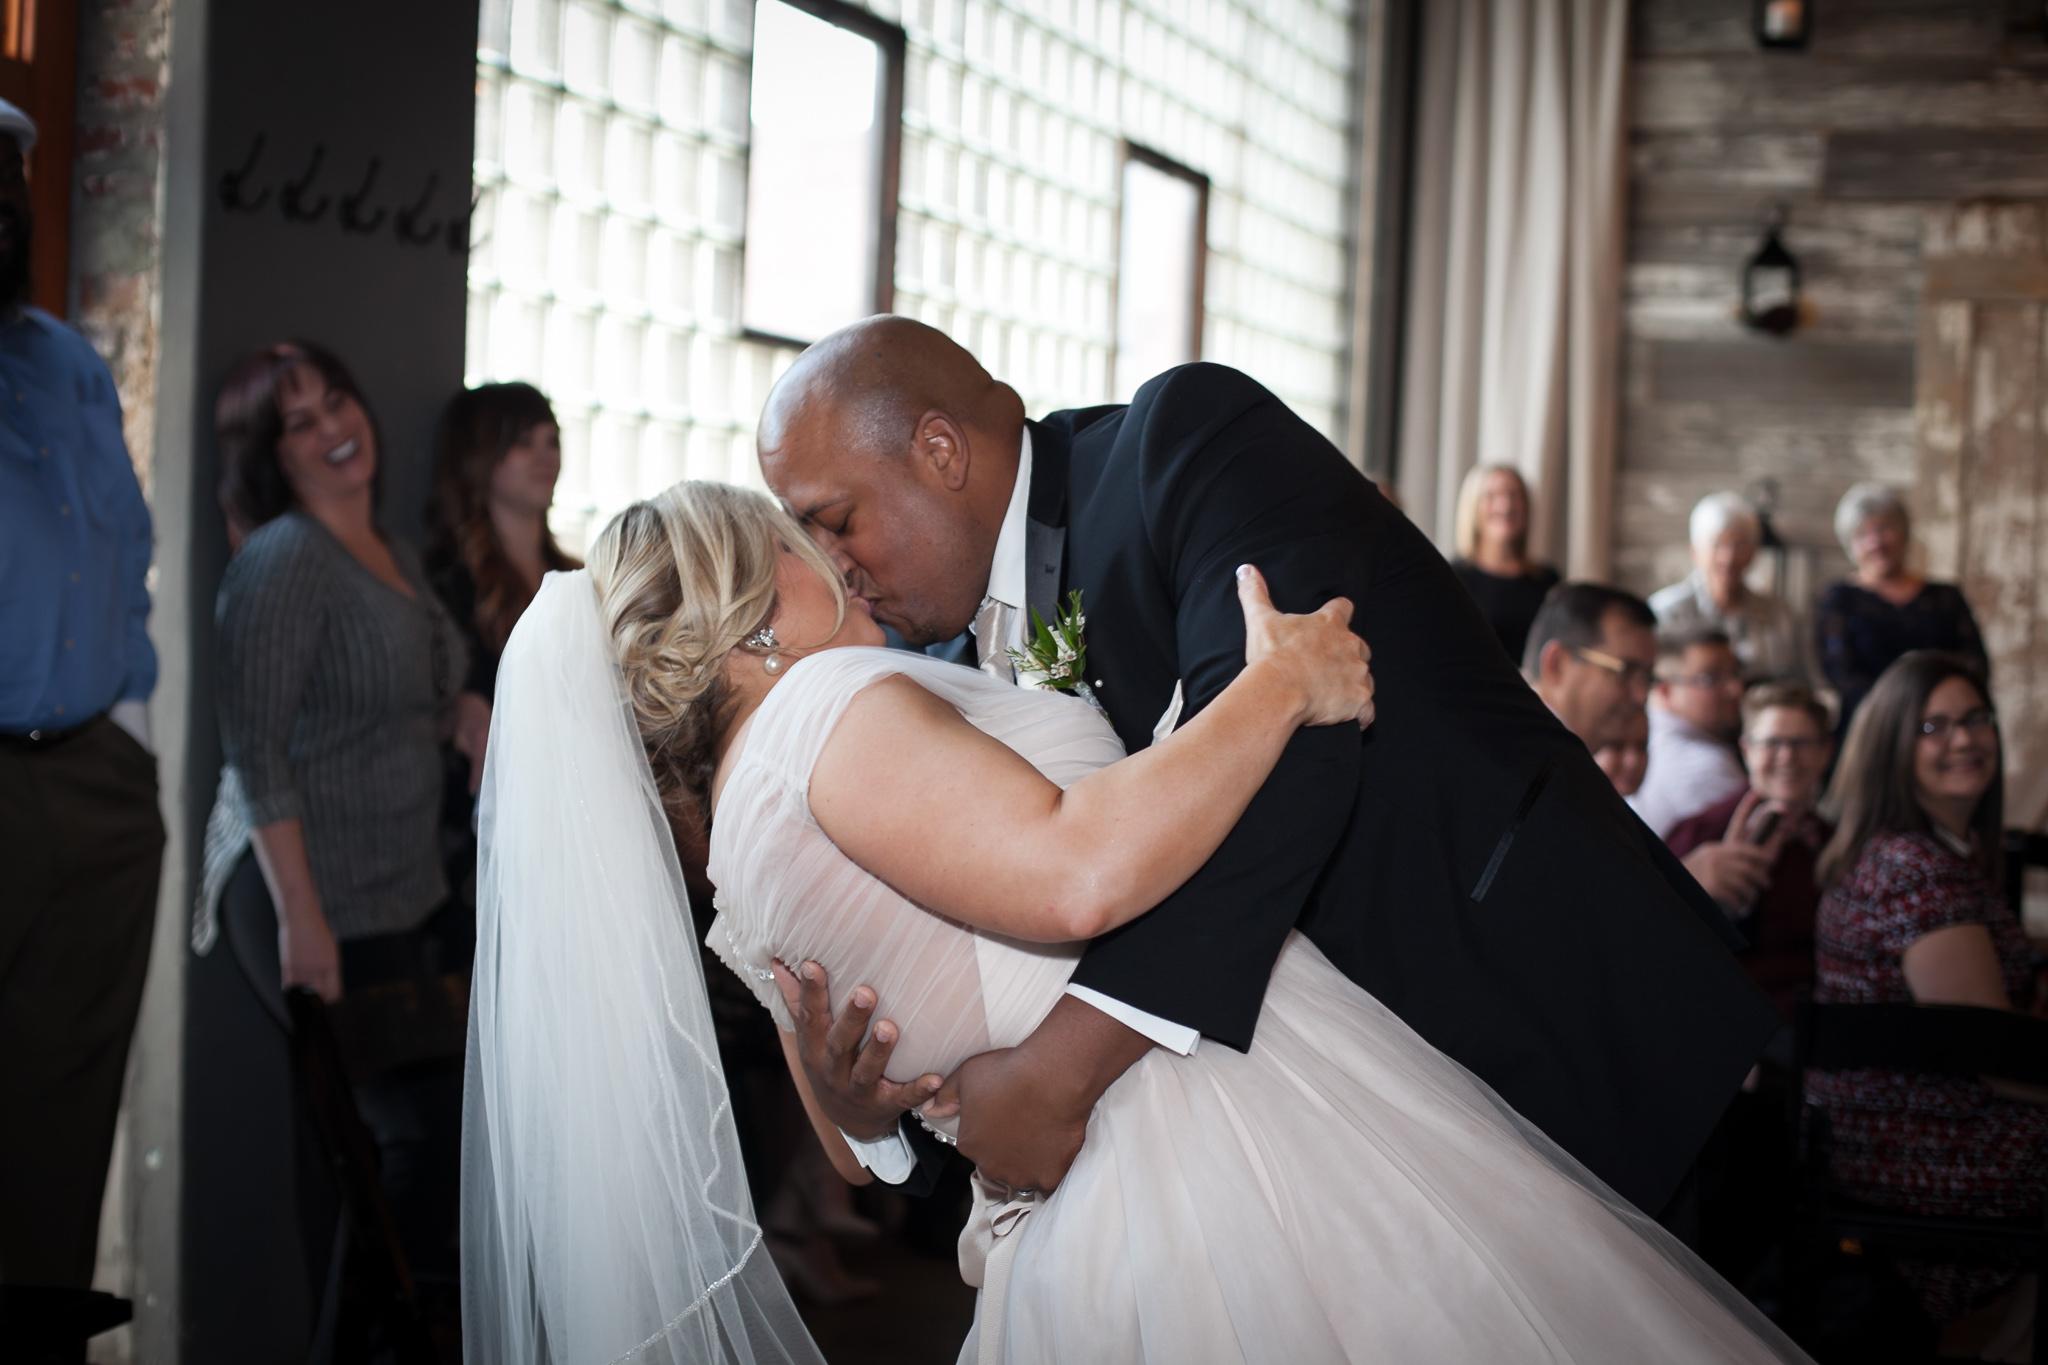 Wedding_Day_Moments_To_Do_List_Amy&Arron-121.jpg